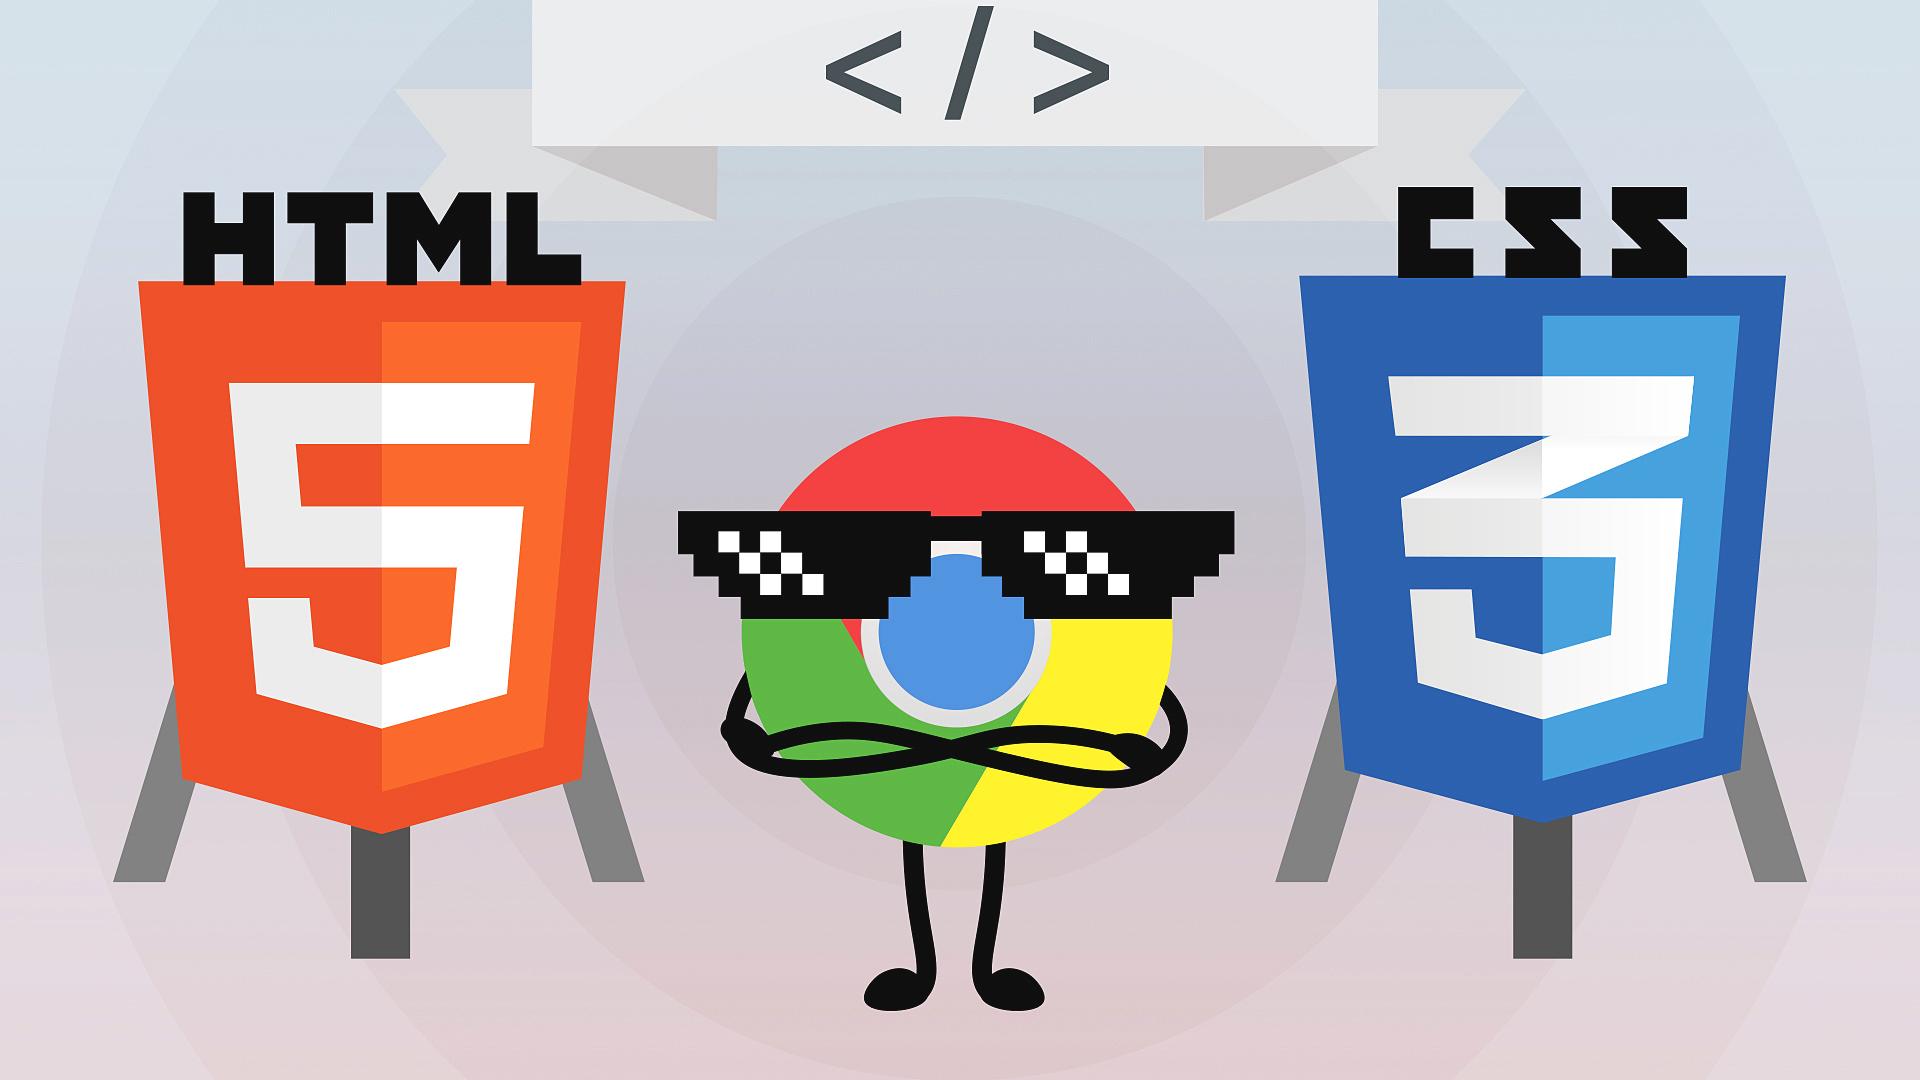 Вебинар Разработка HTML/CSS в Google Chrome - только хардкор! фото